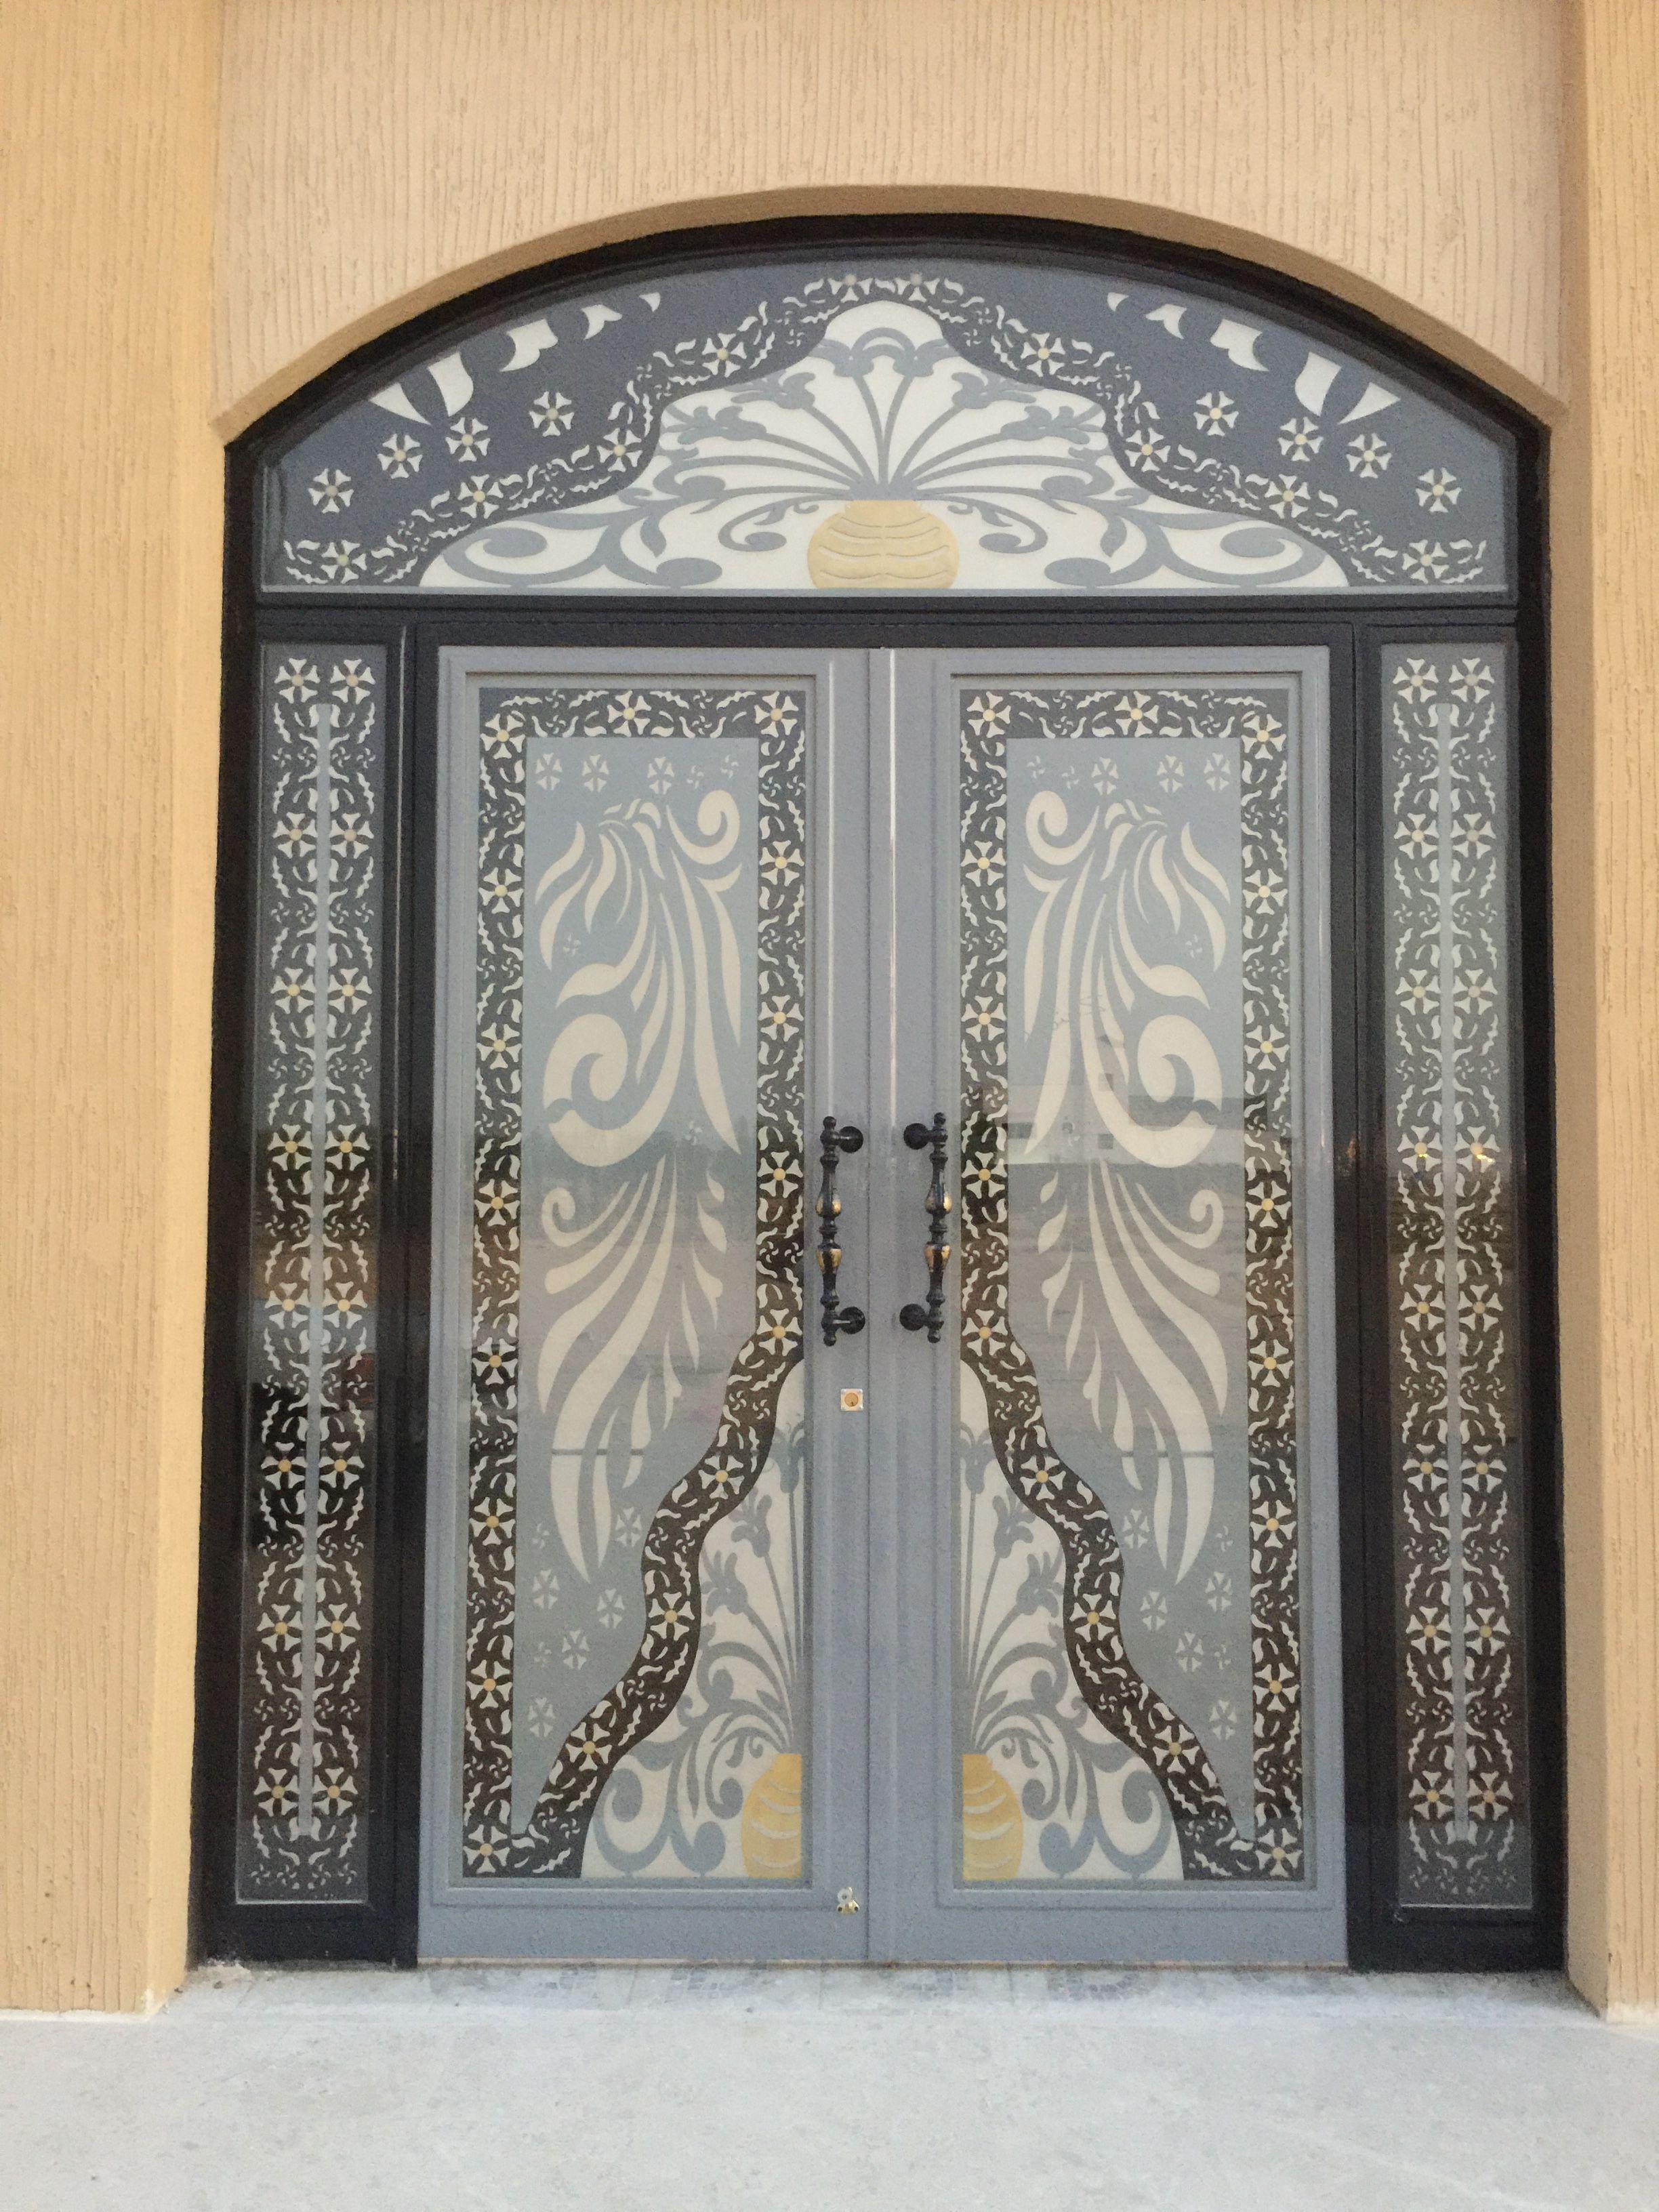 Pin By ابواب درج حديد القصور الذهبية On ابواب خارجية Metal Doors Exterior Door Gate Design Classic House Design